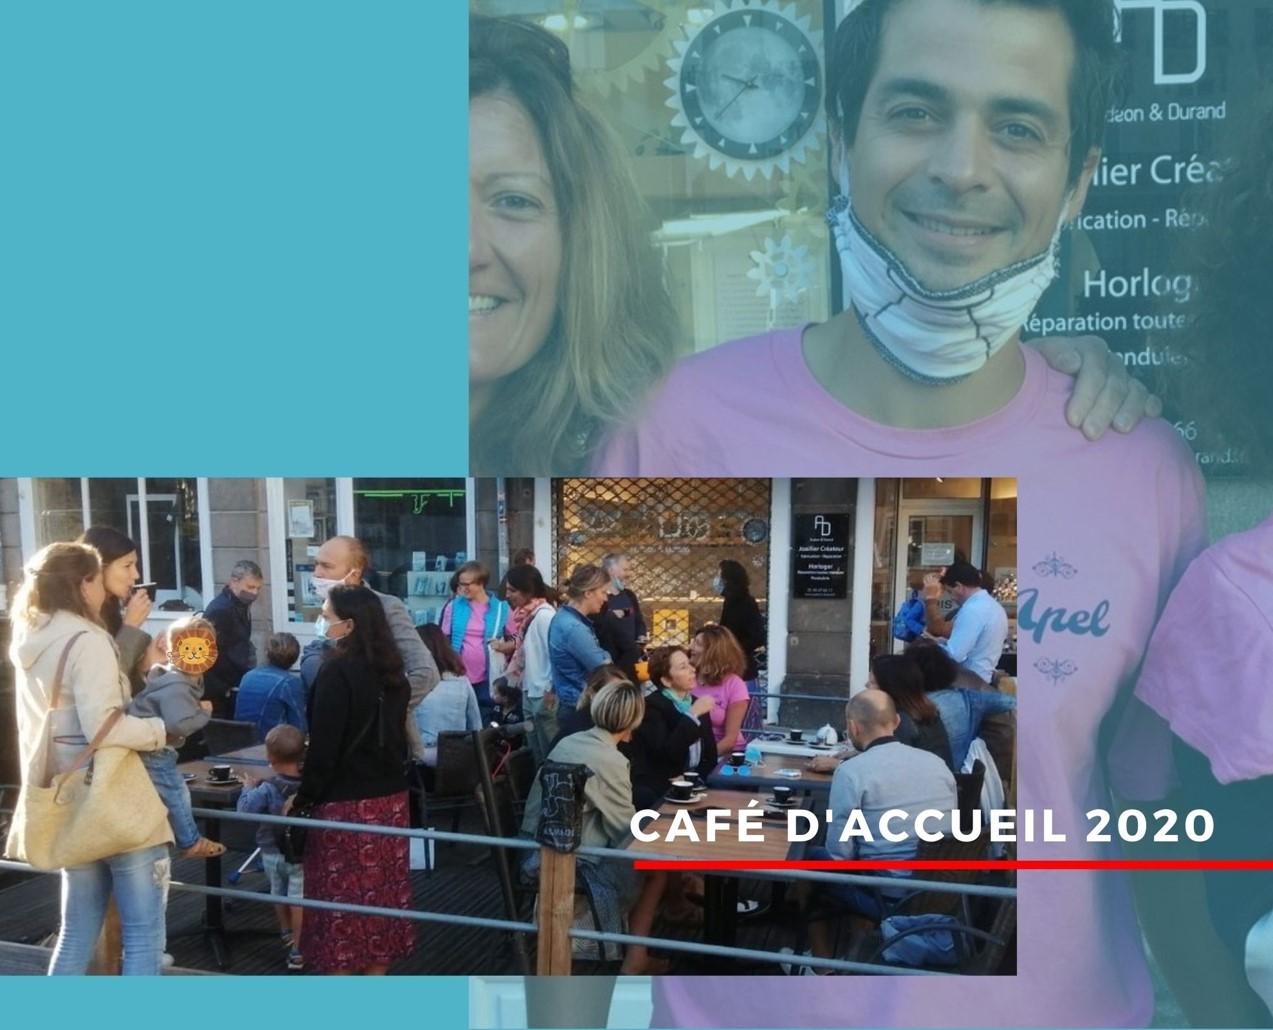 cafe-daccueil